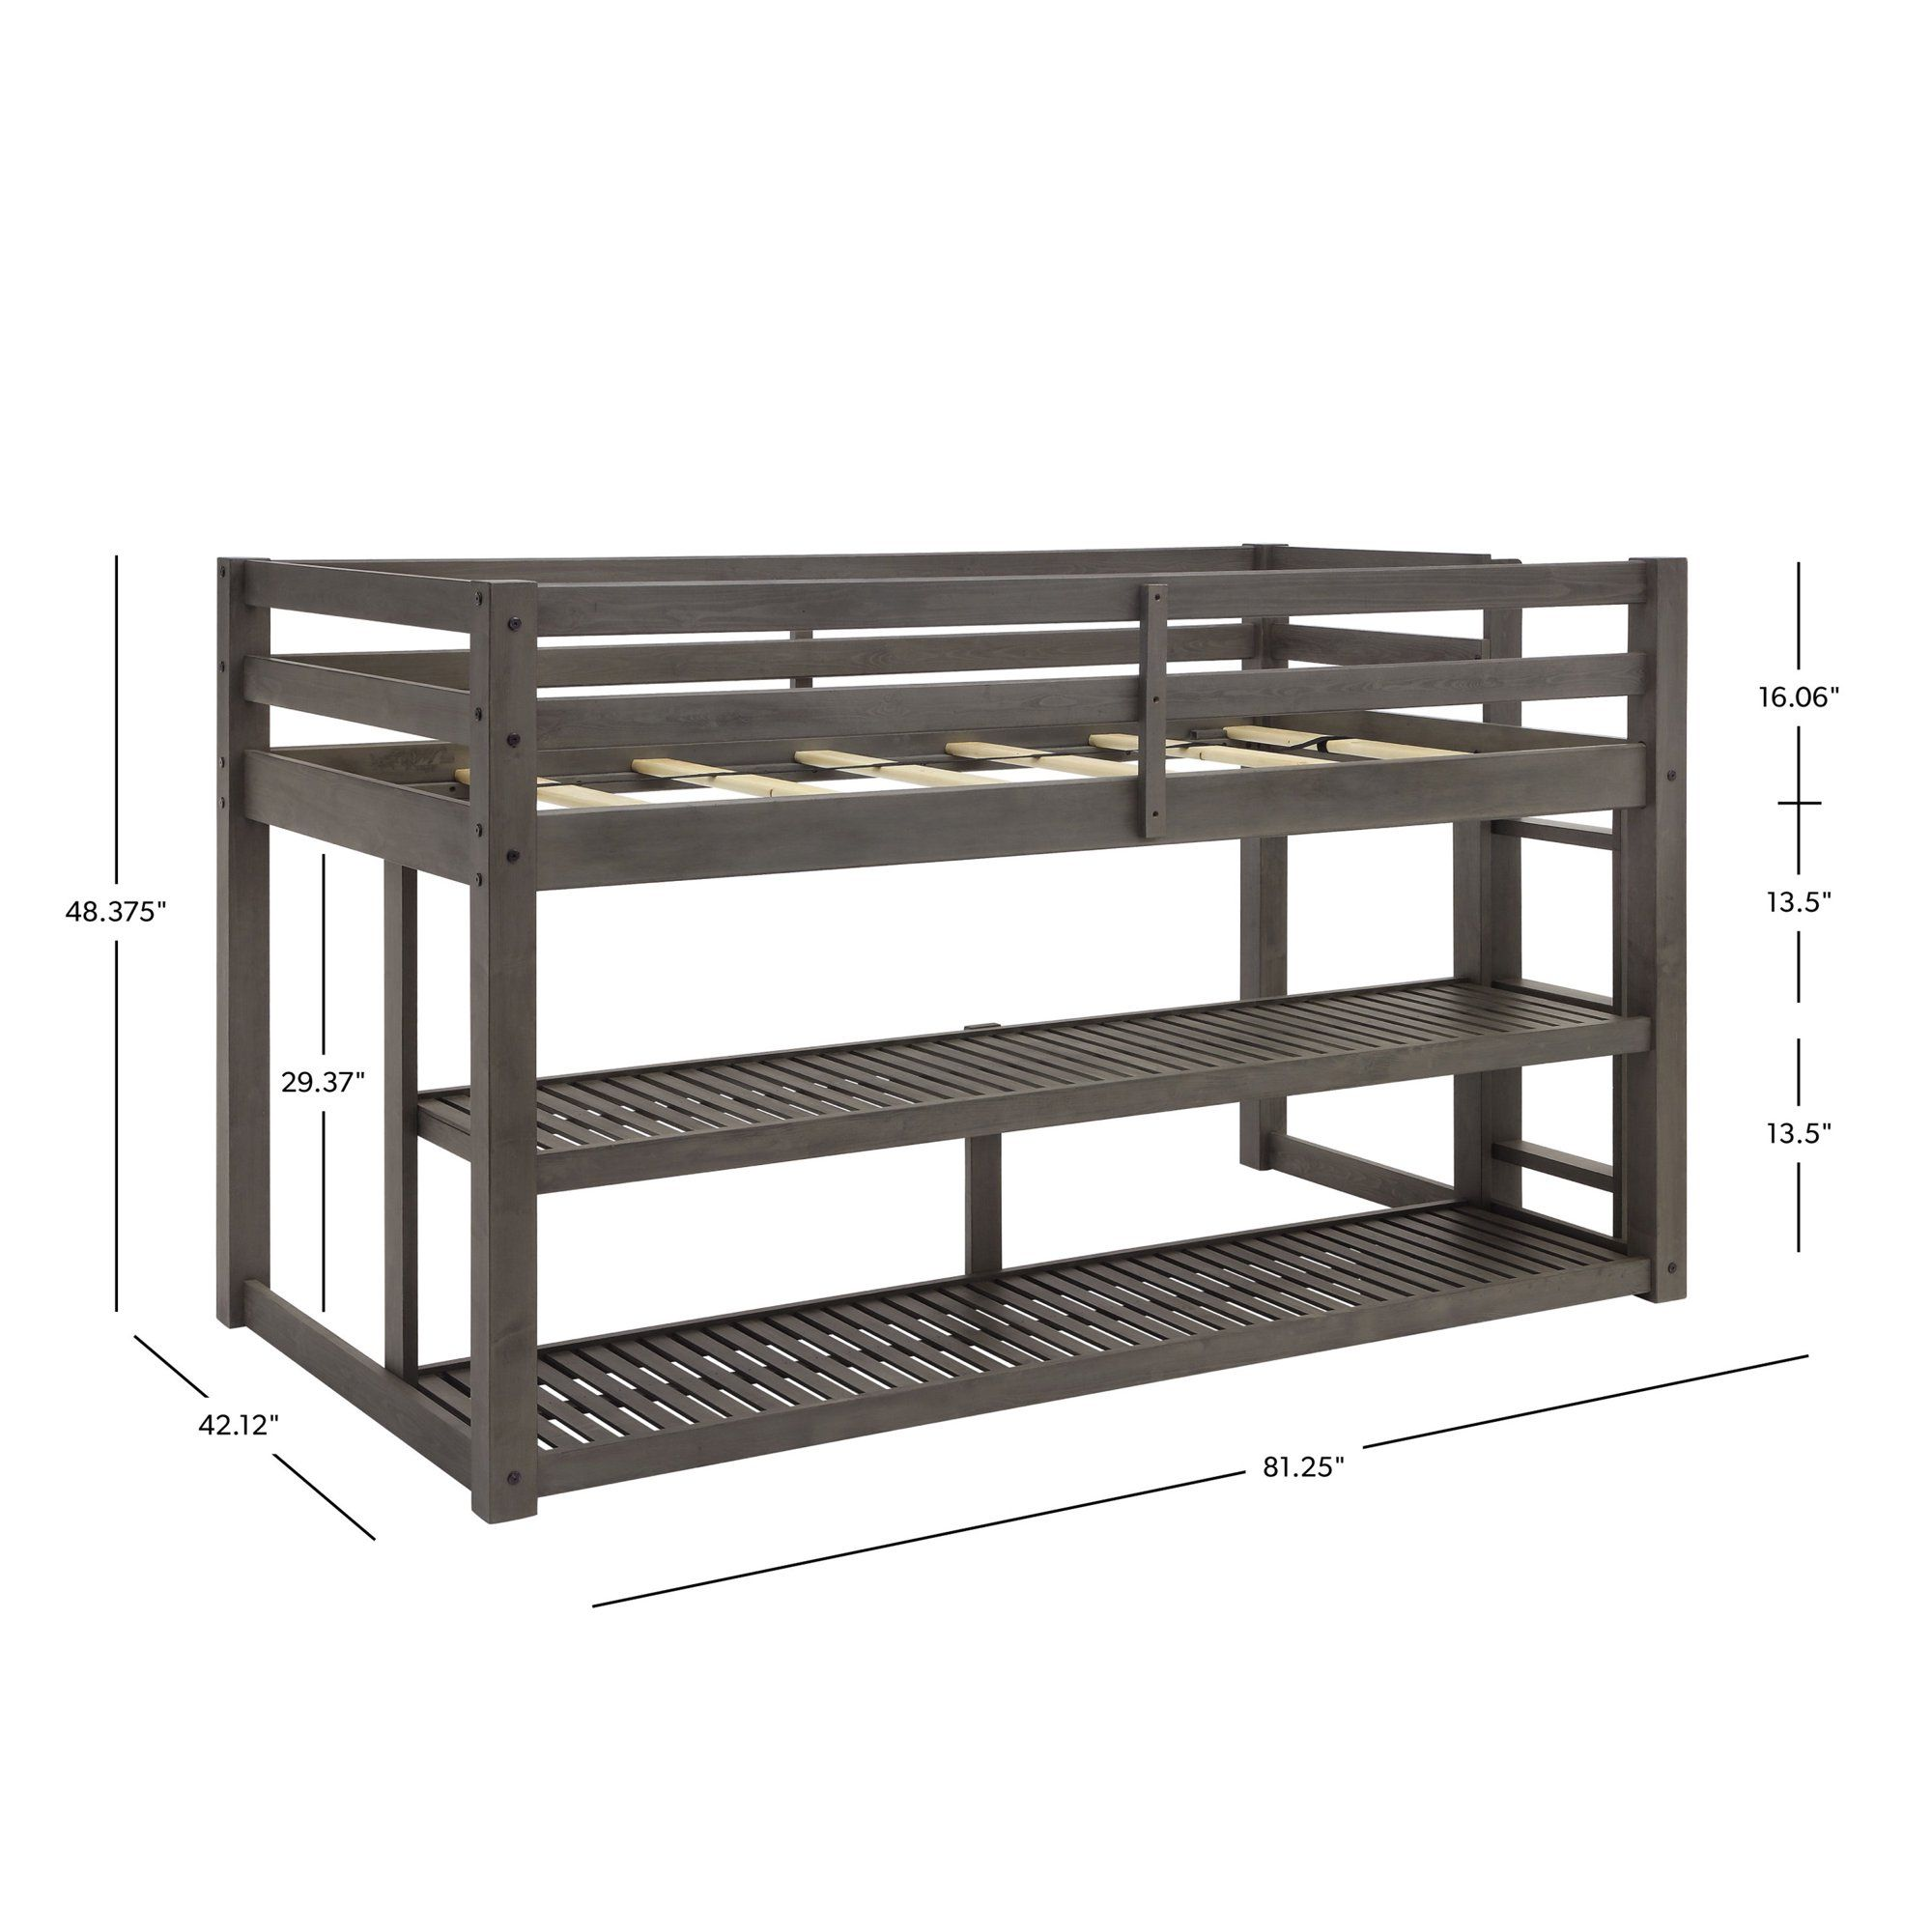 fddd0533e4ed2b49473ac36ff5cd1461 - Better Homes & Gardens Loft Bed With Spacious Storage Shelves